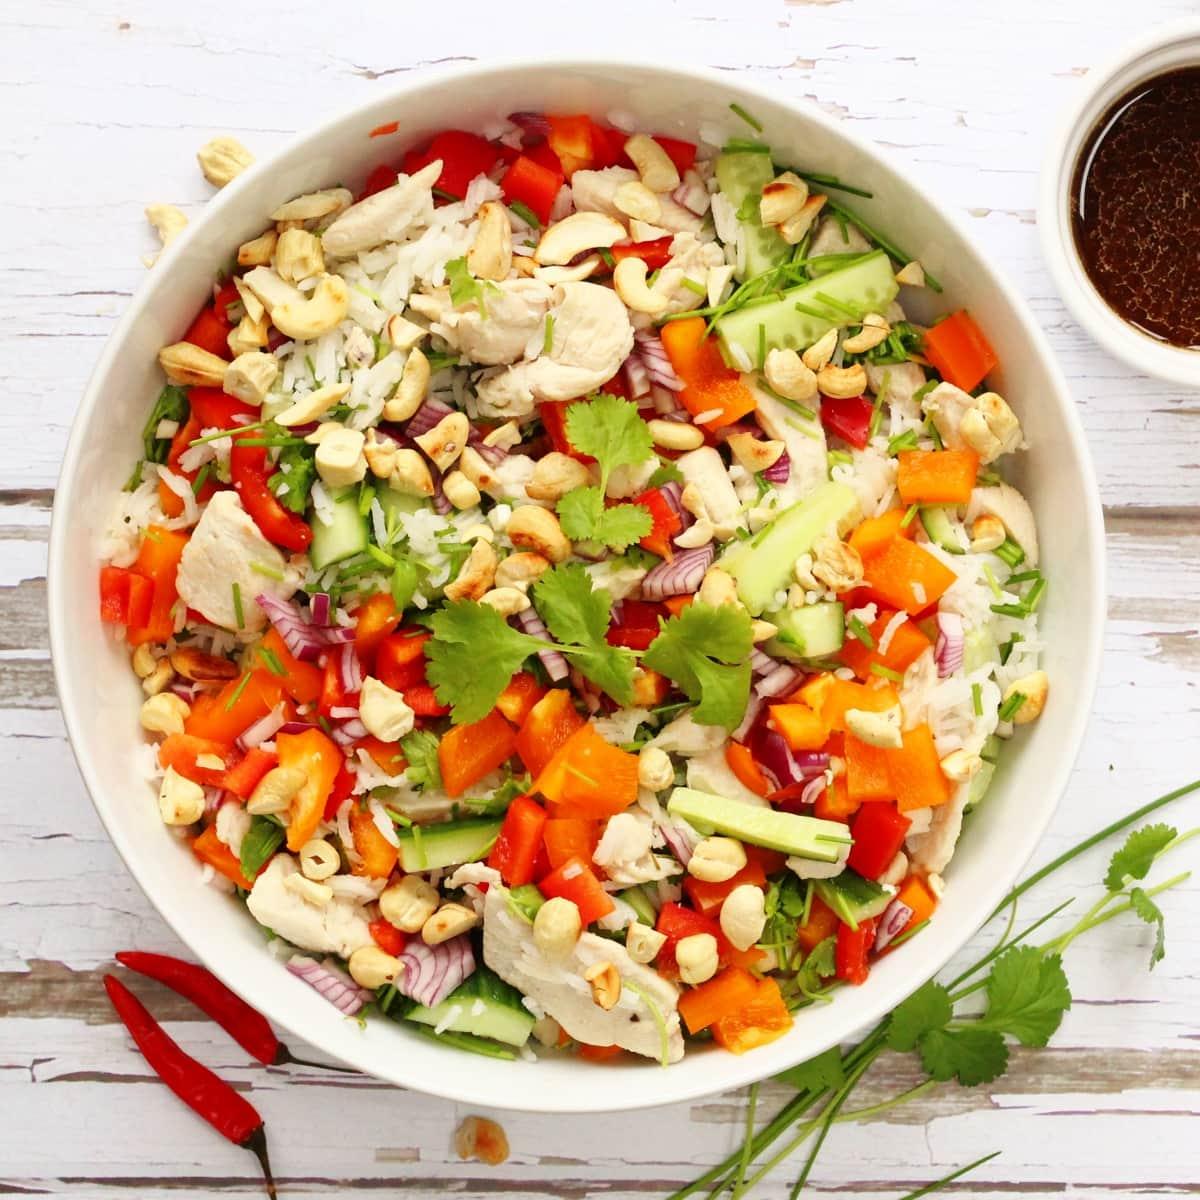 Vietnamese rice and chicken salad